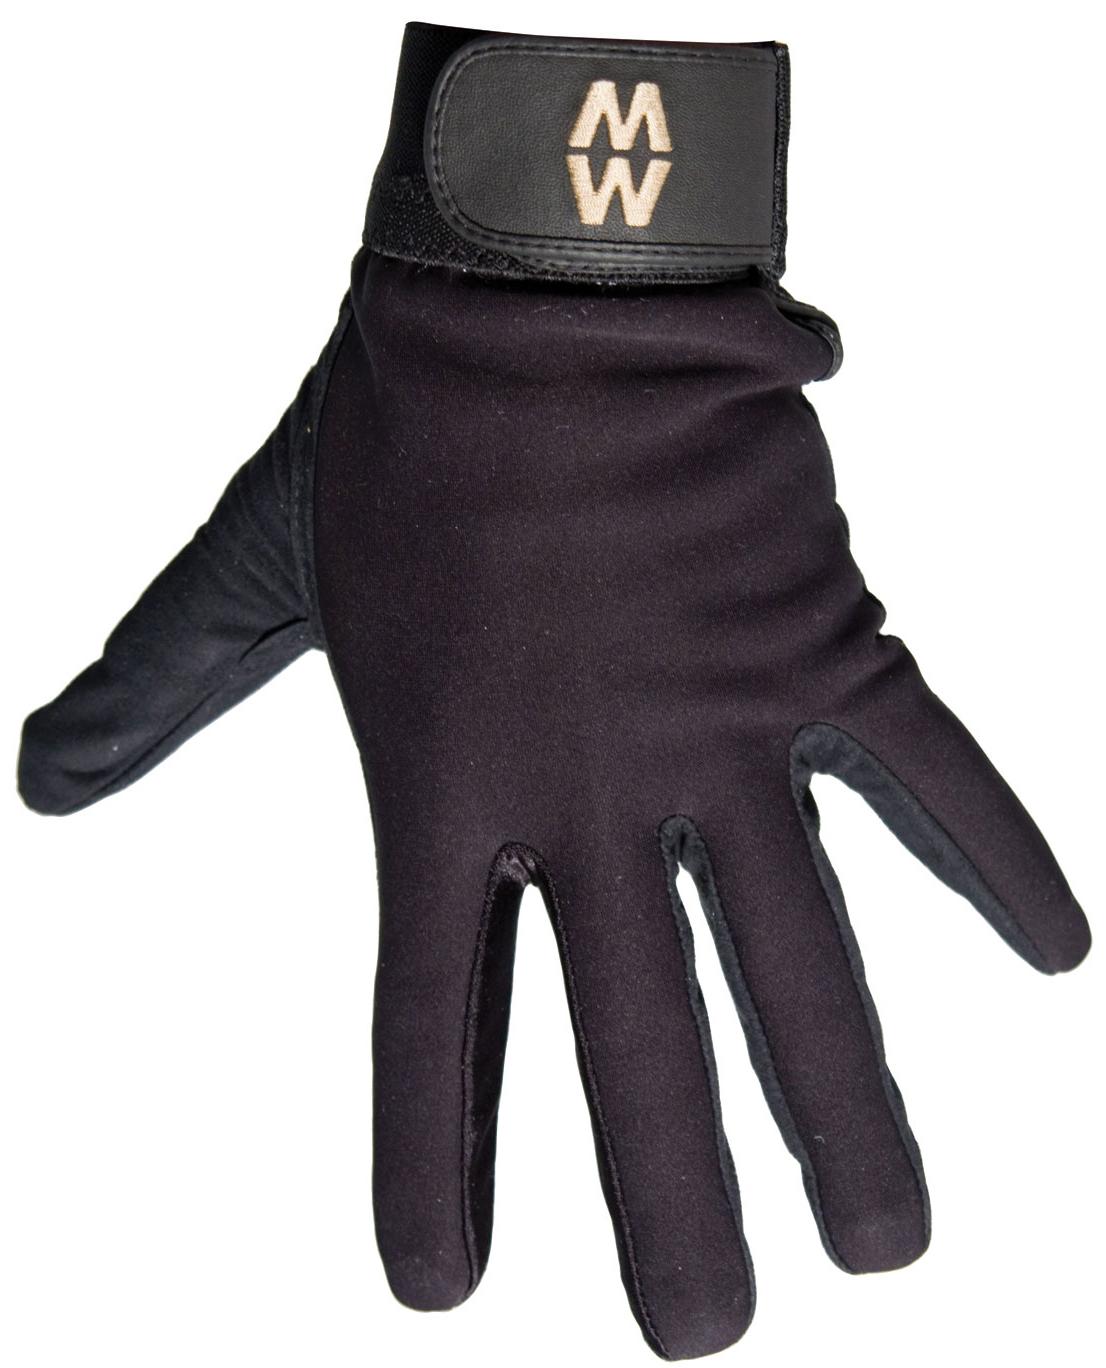 Premium Sports Gloves Short Cuff Macwet Mesh Equestrian Horse Riding Gloves